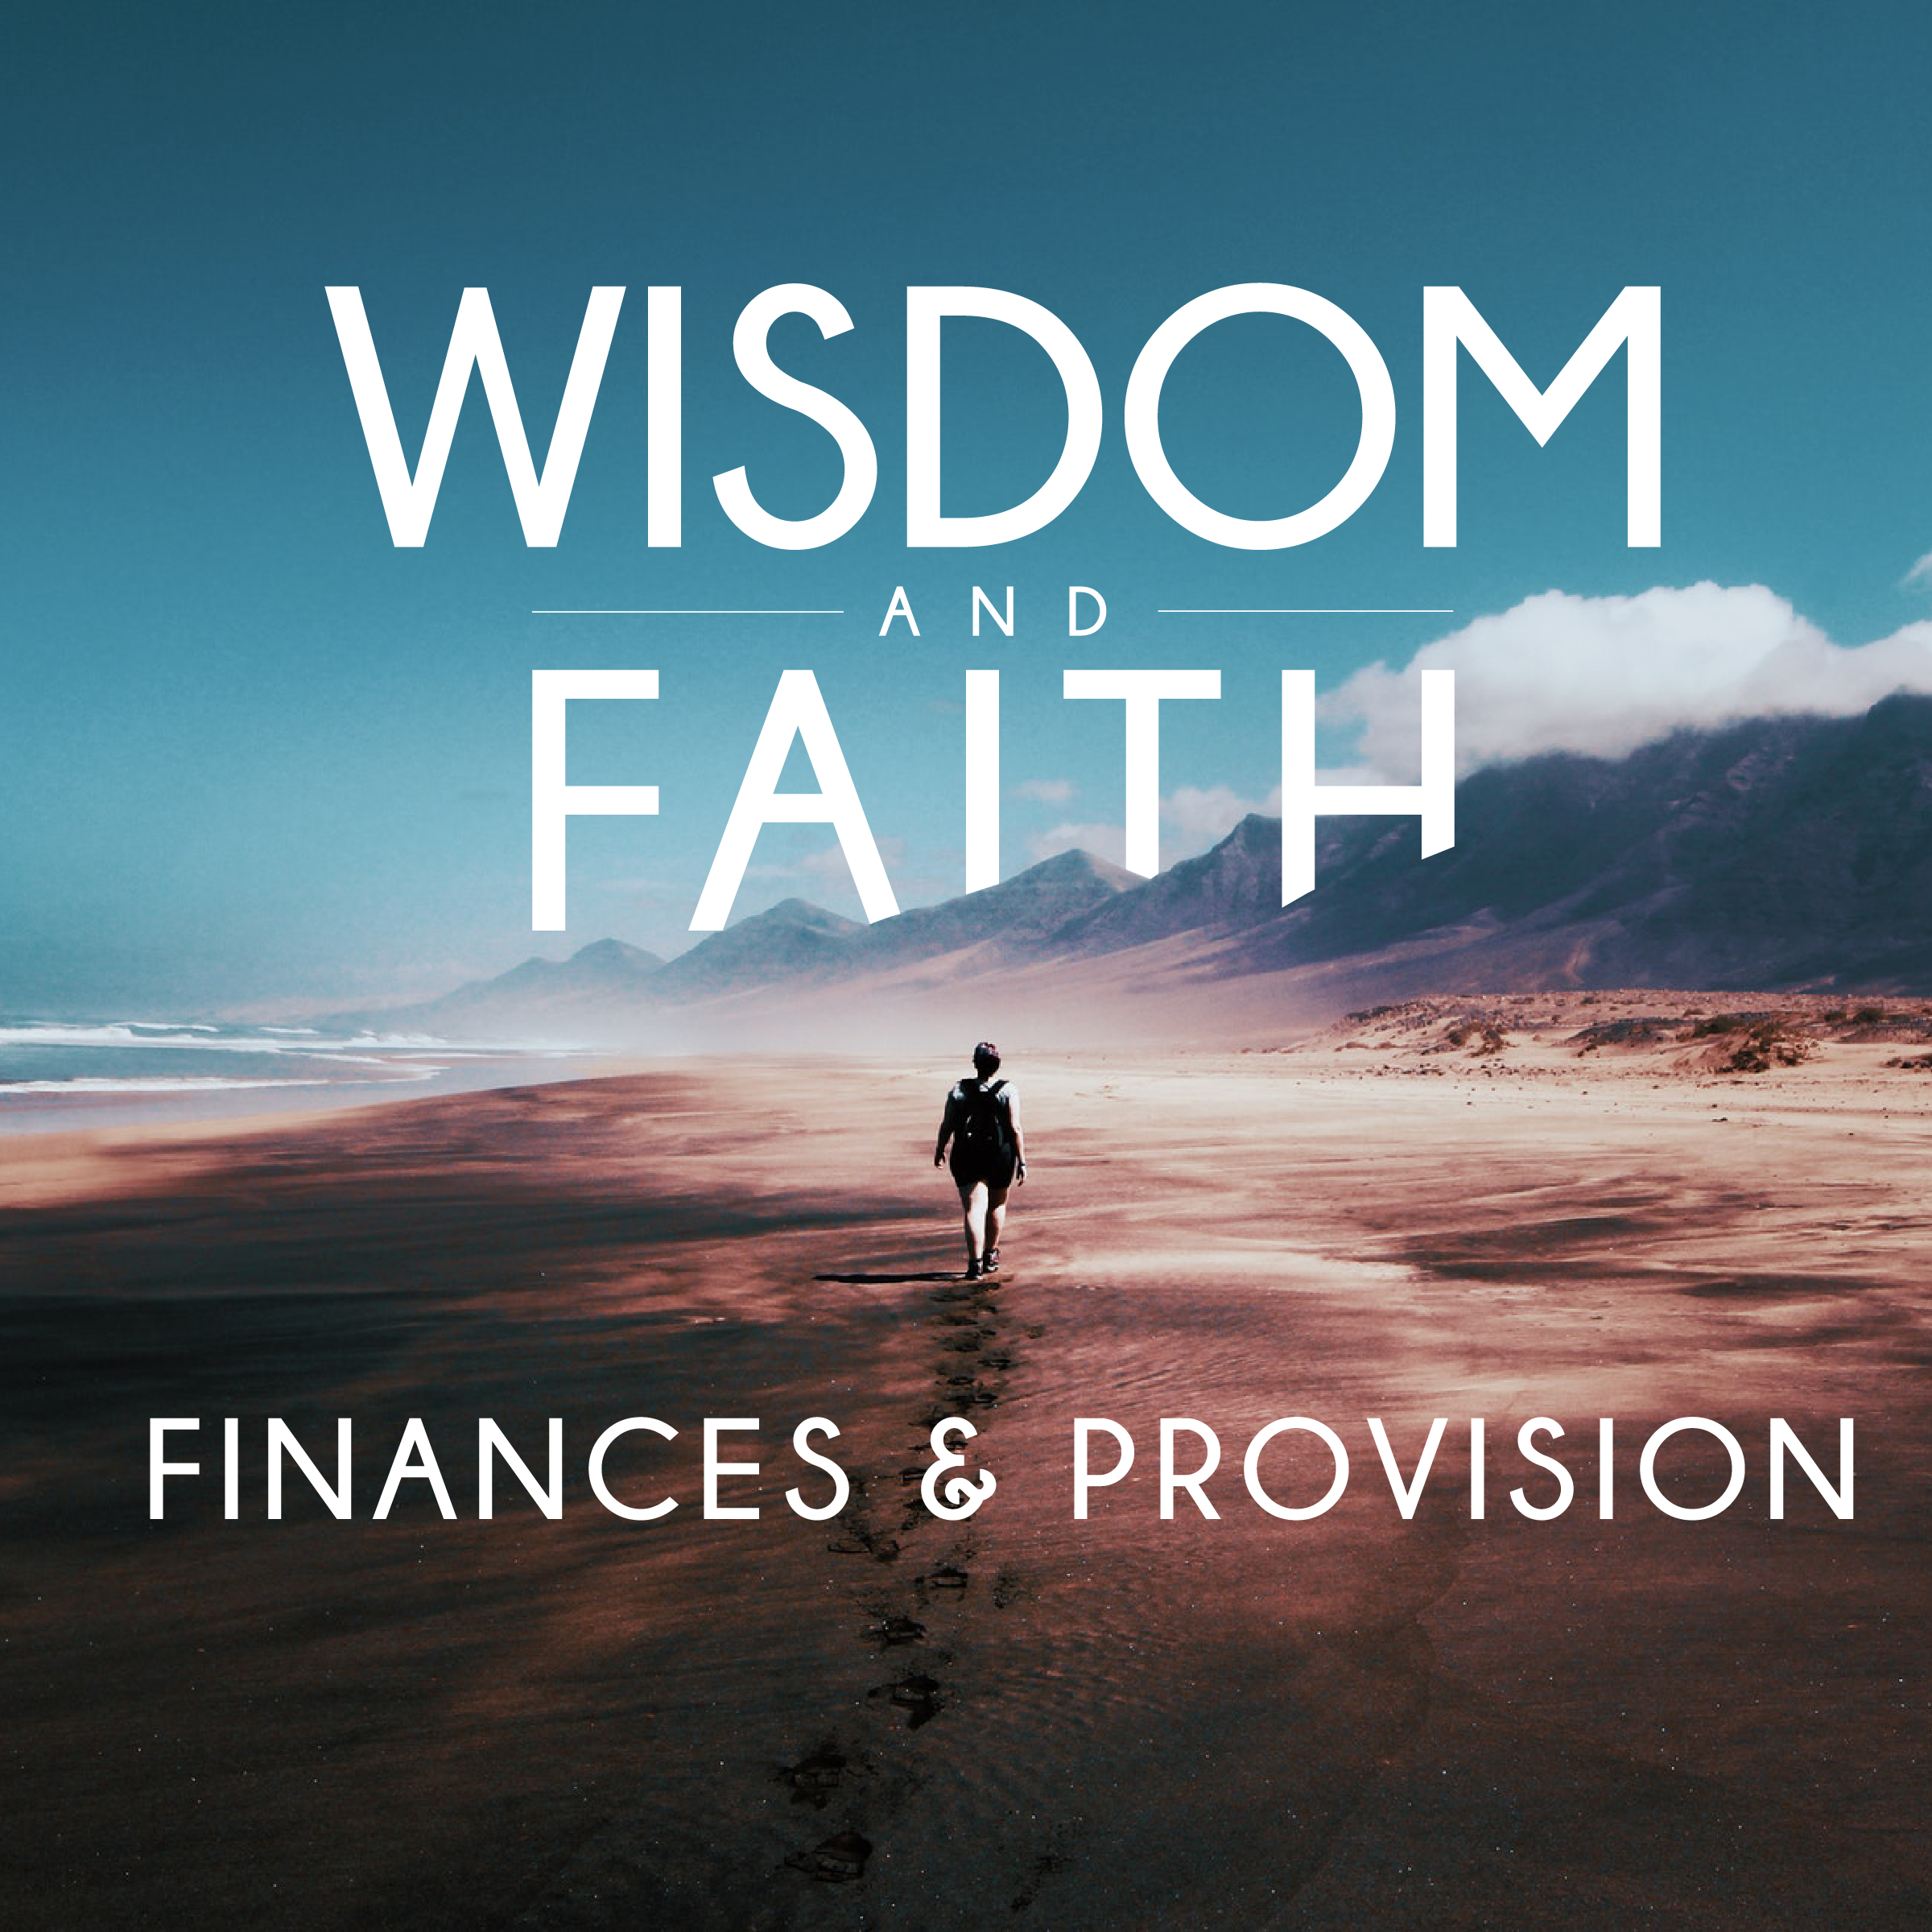 Wisdom & Faith: Finances & Provision